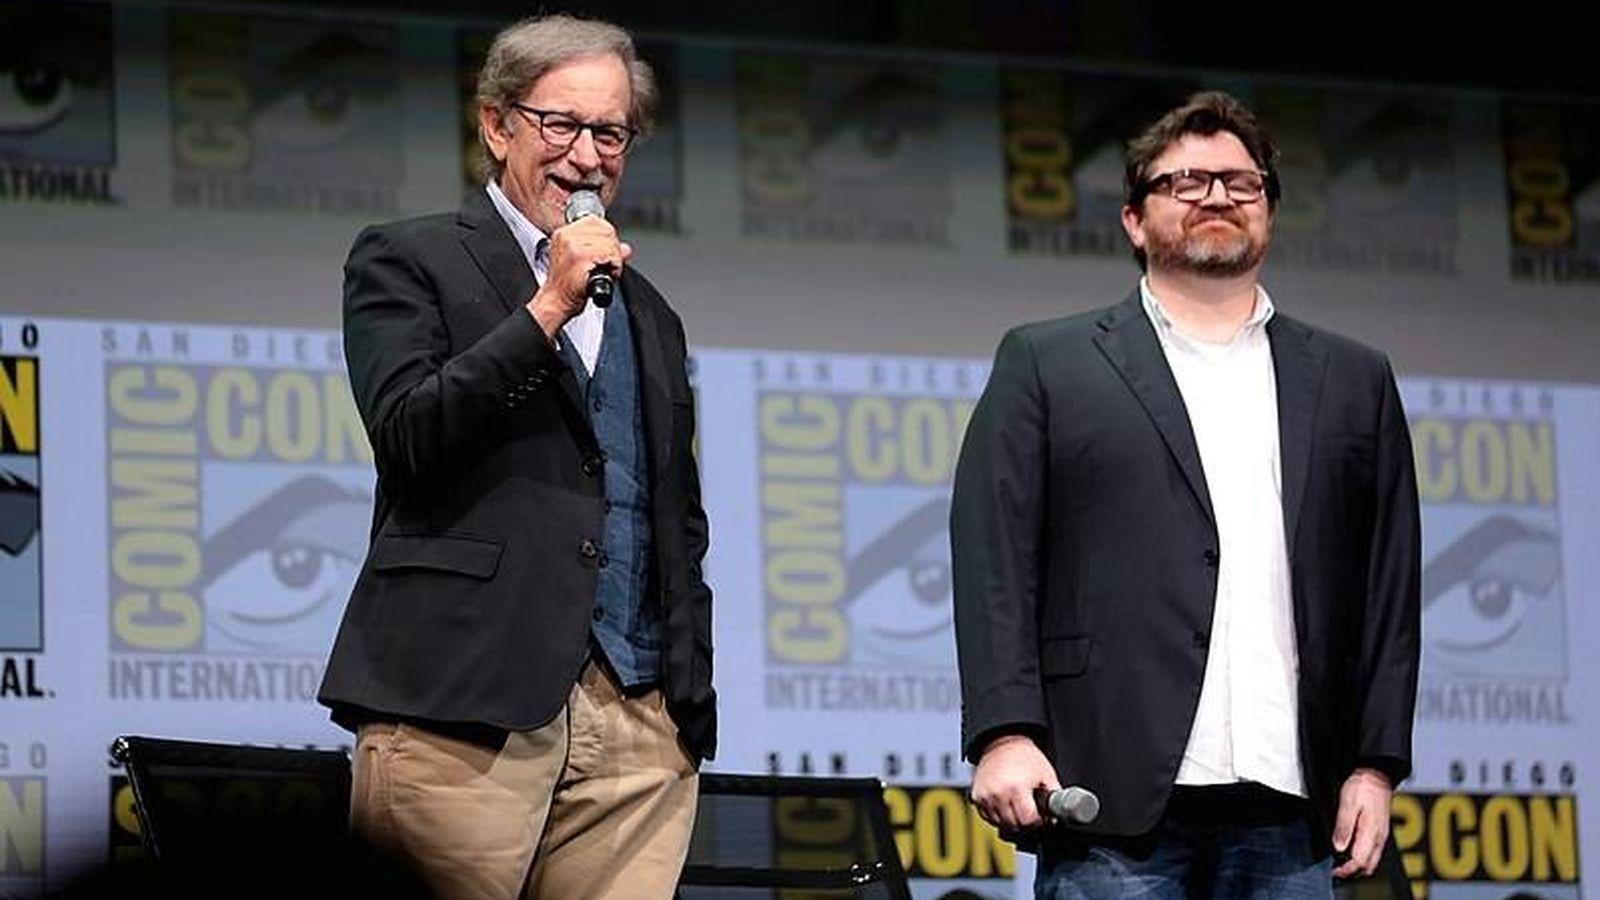 Foto: Steven Spielberg y Ernst Cline en la ComicCon de 2017 en San Diego. (Wikipedia)